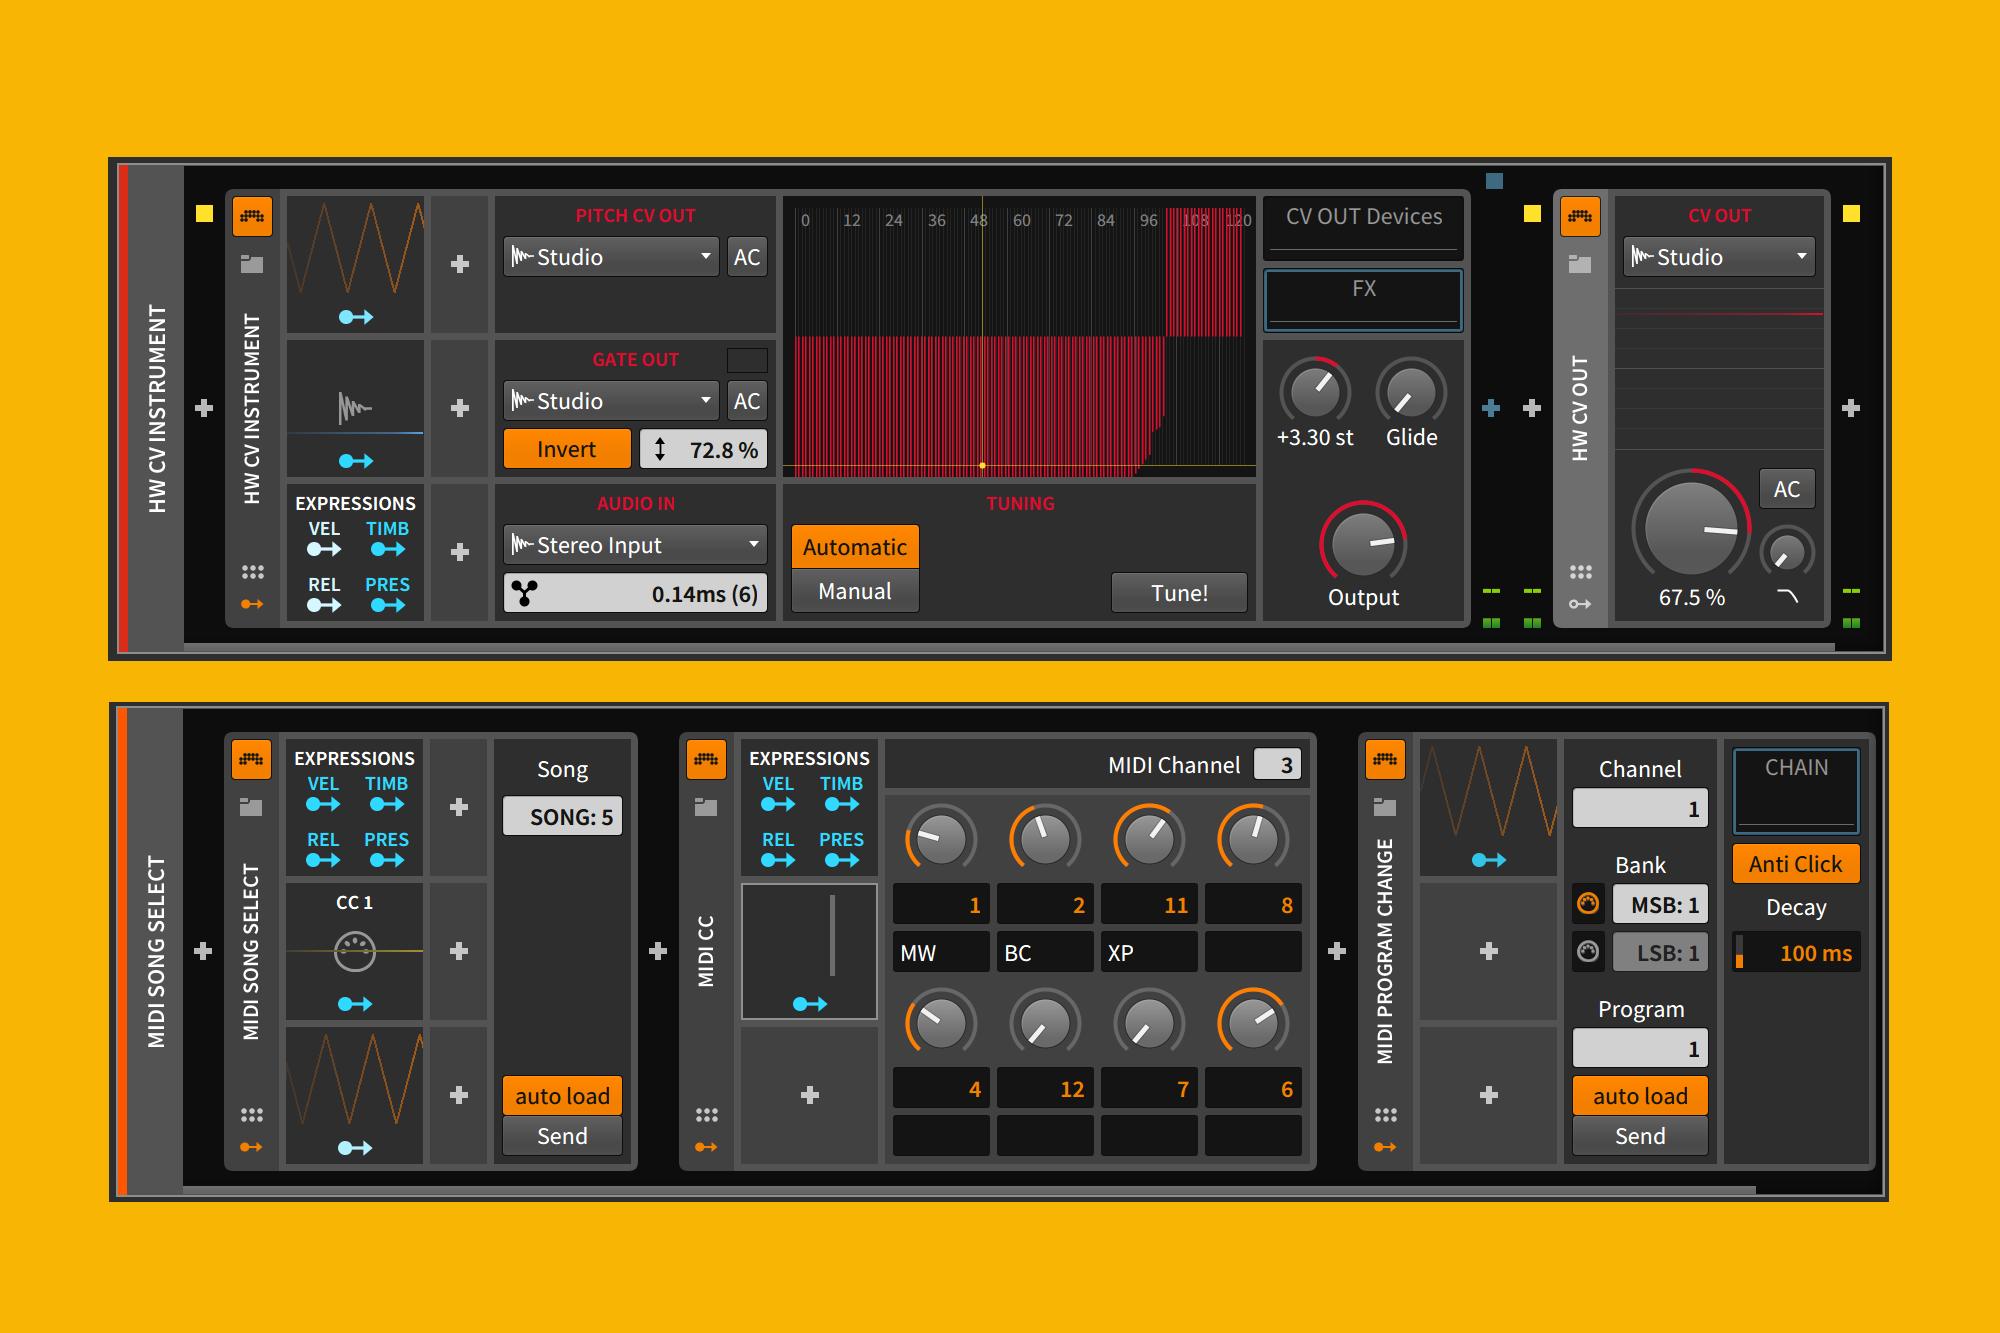 Midi Devices Full Control : bitwig studio 2 review an innovative daw that rivals ableton live ~ Vivirlamusica.com Haus und Dekorationen